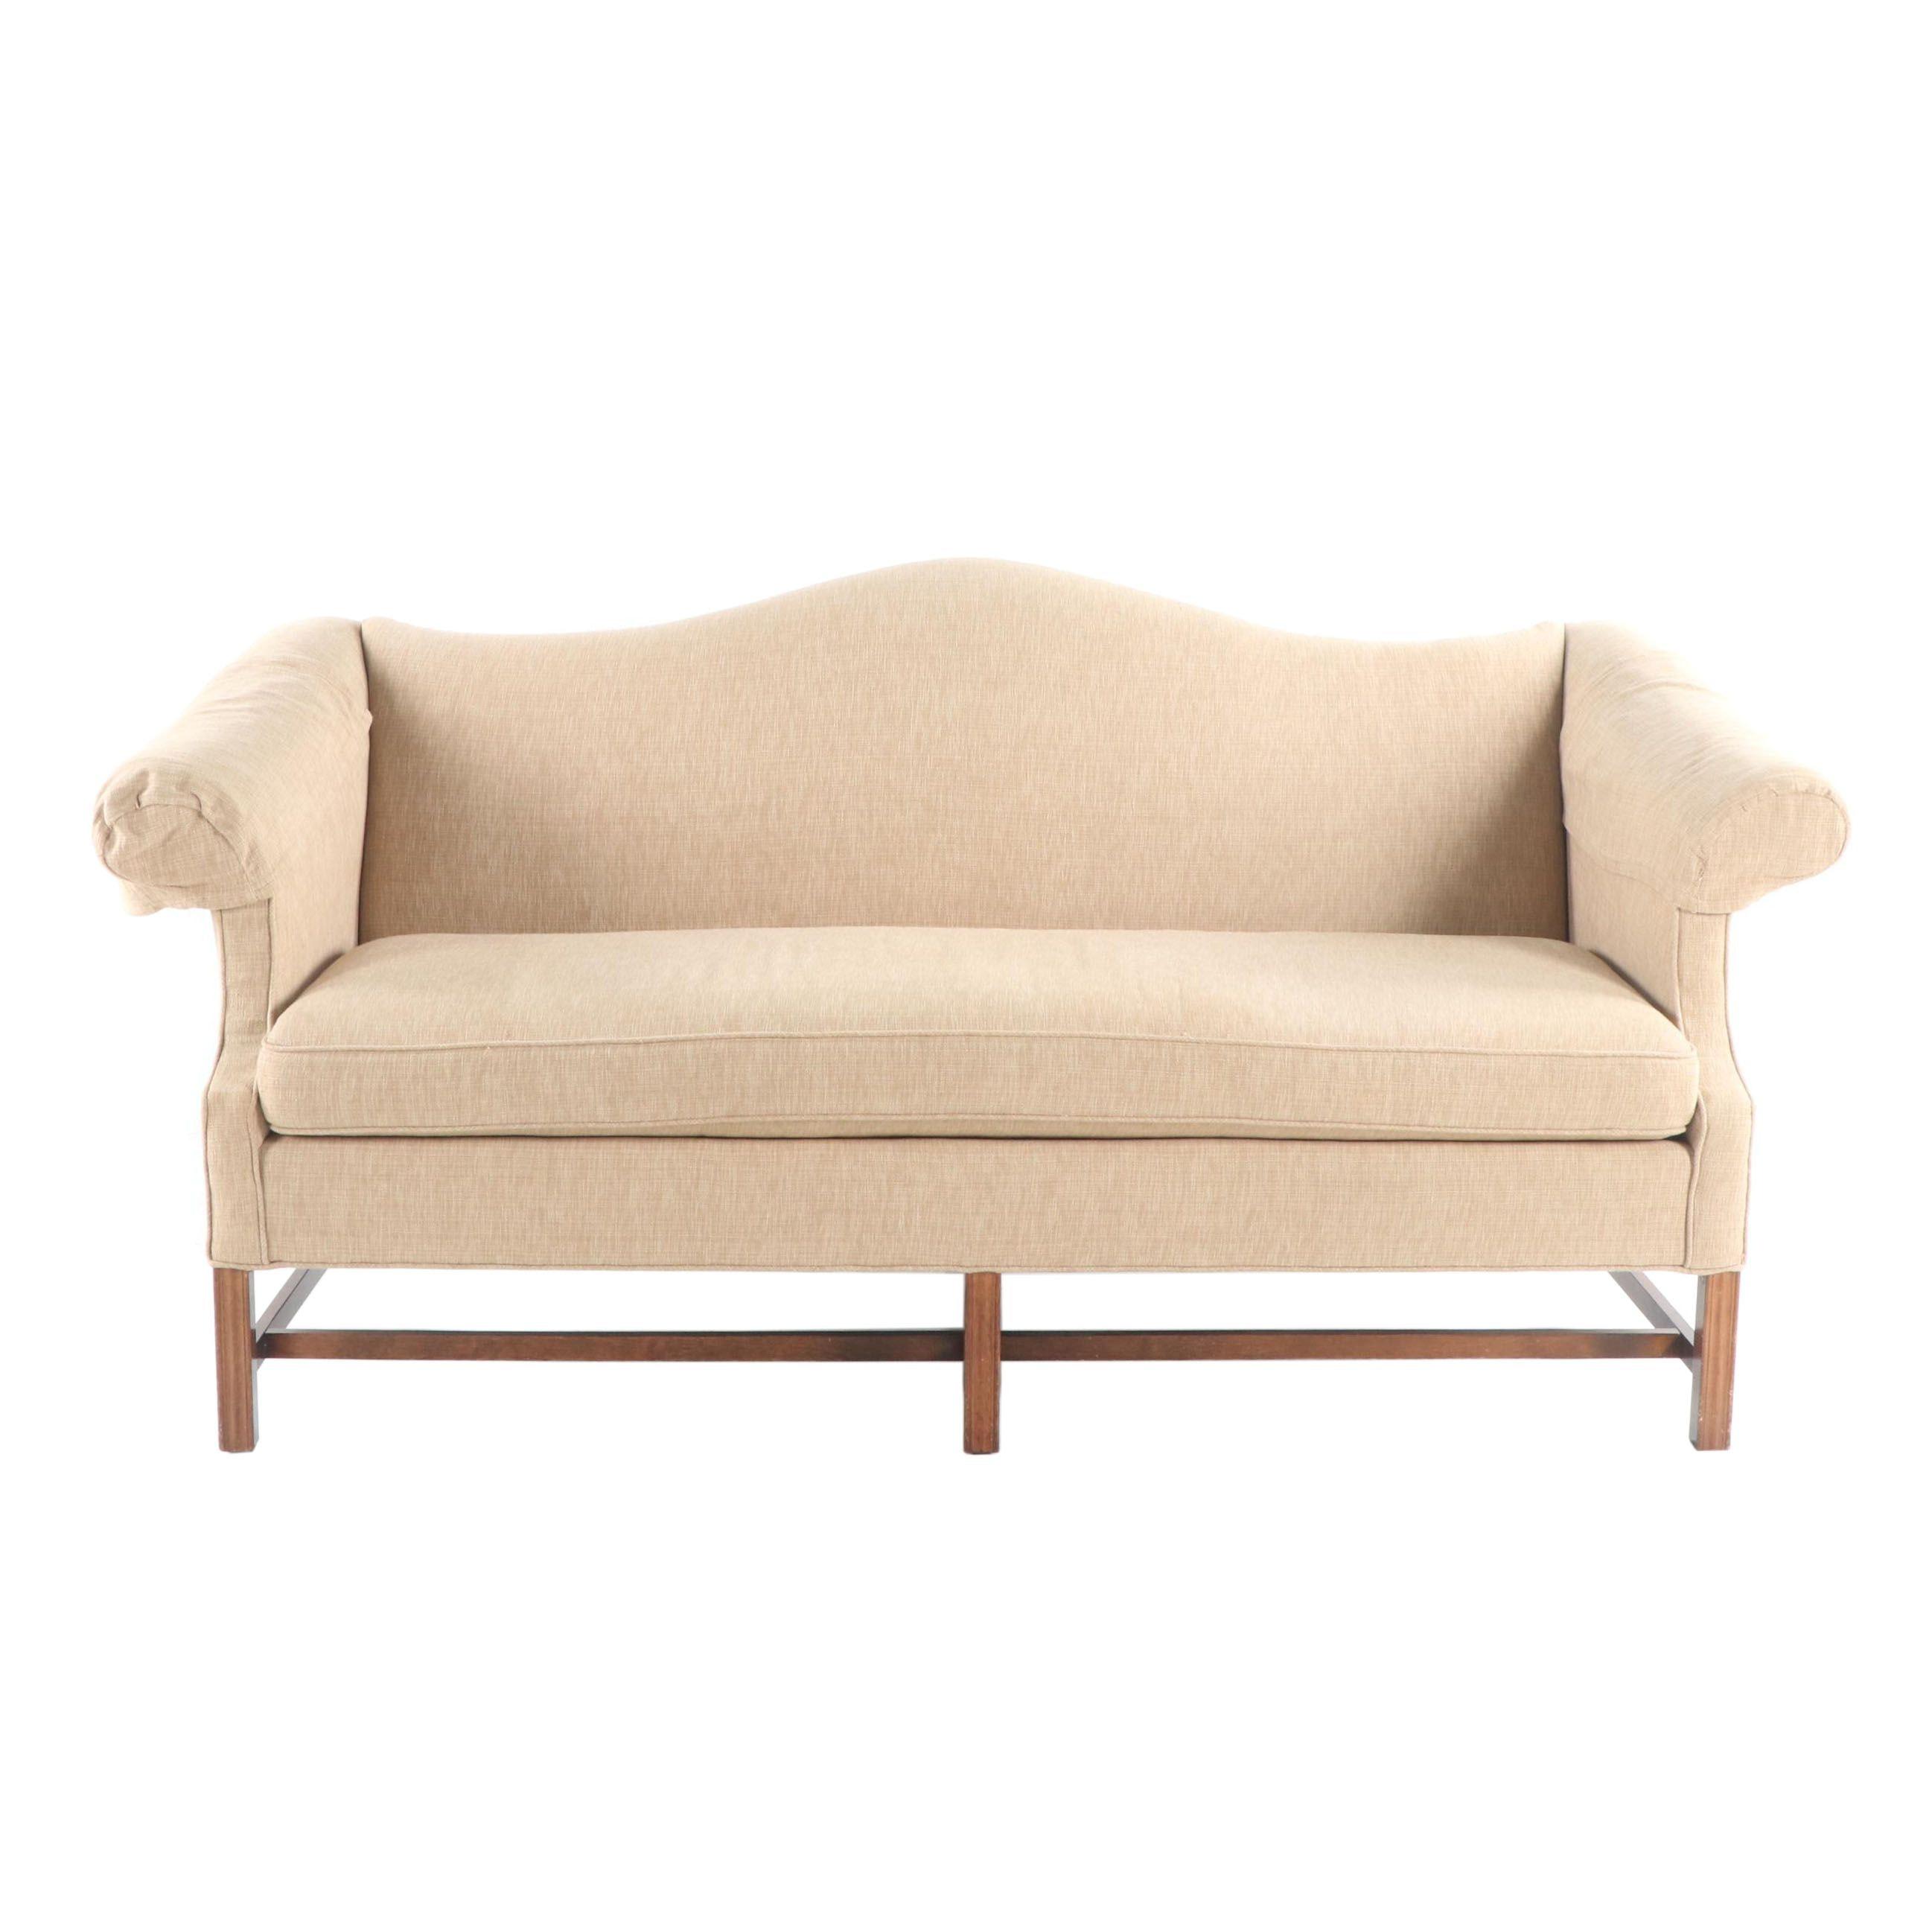 Federal Style Upholstered Camelback Sofa, 21st Century